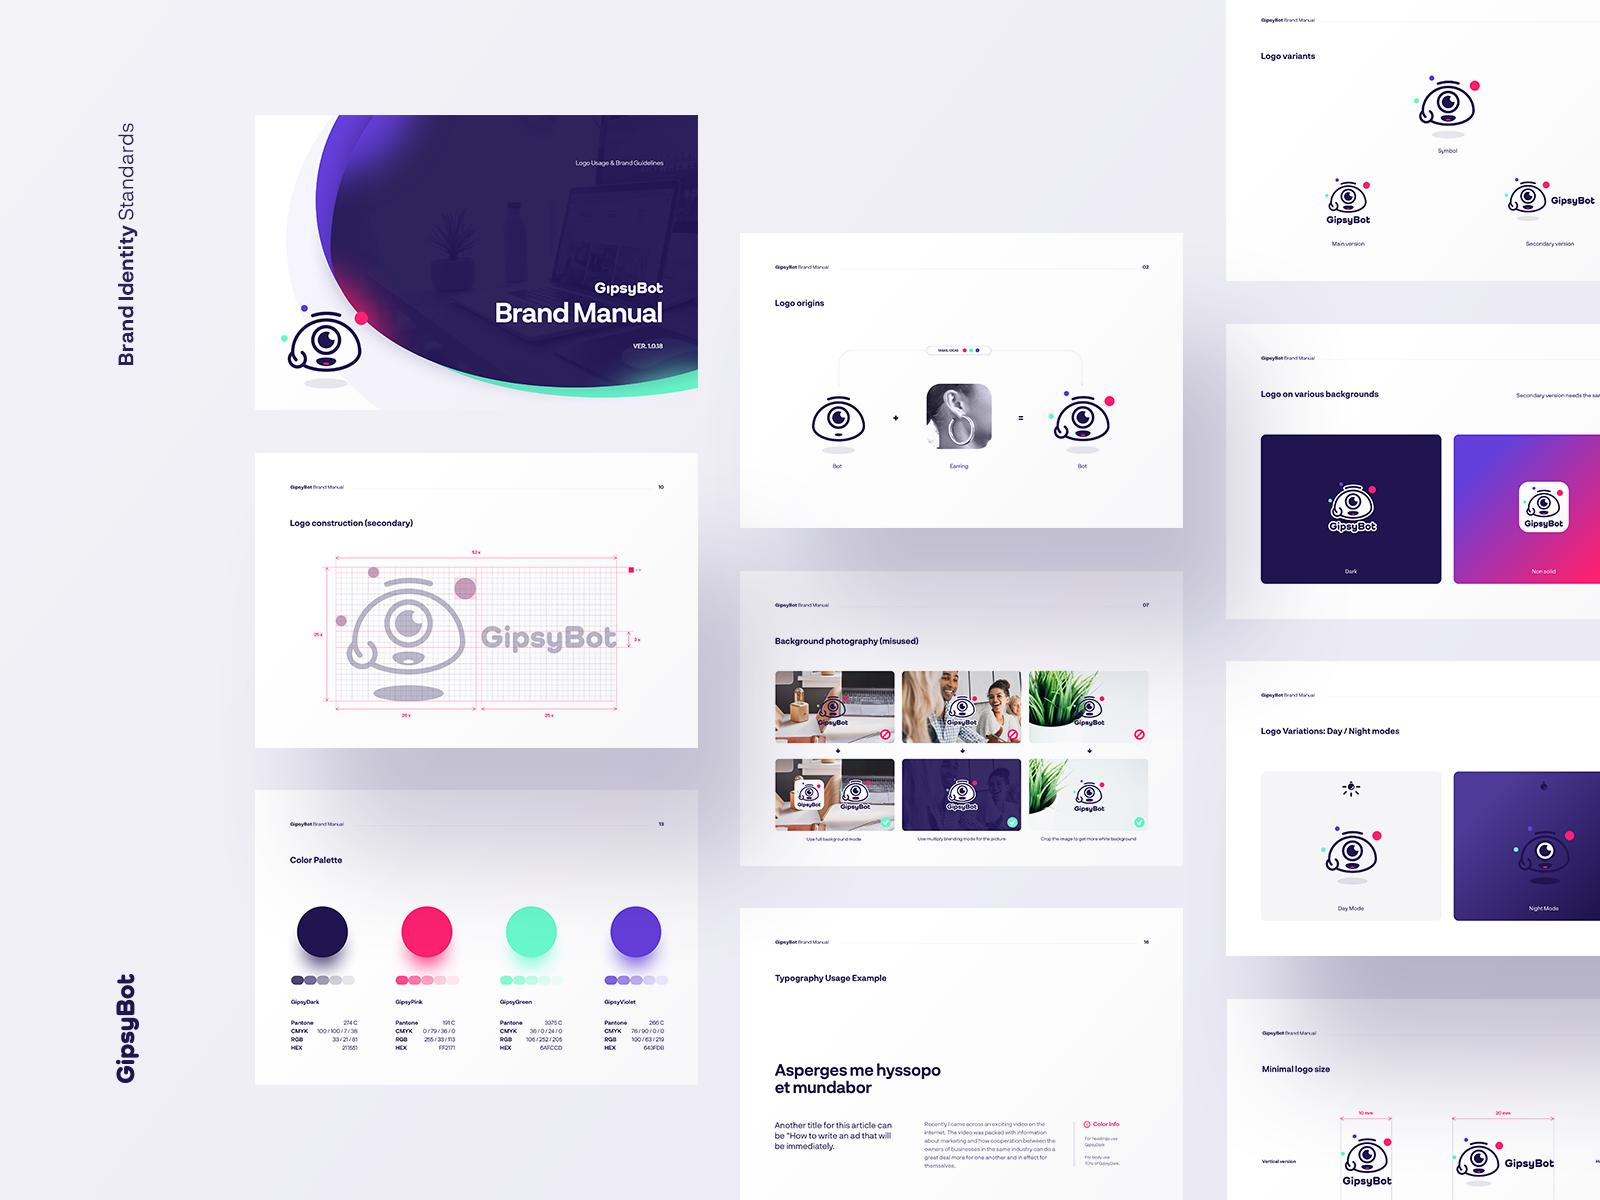 Gipsygipsy Brand Manual Interactive Design Website Design Layout